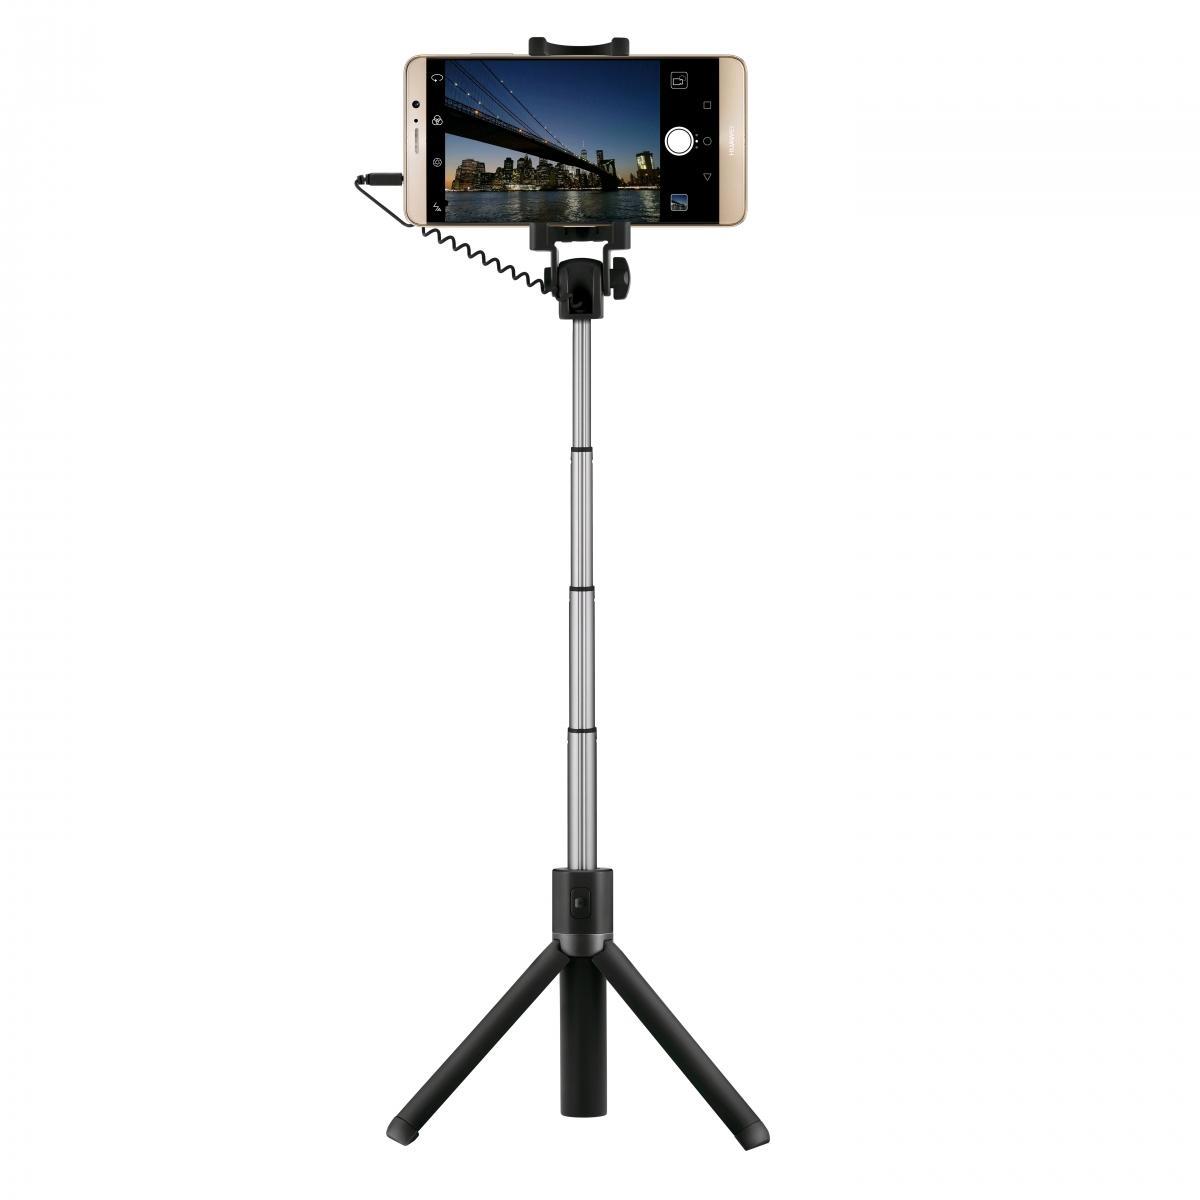 Huawei AF14 Selfie/Tripod Black